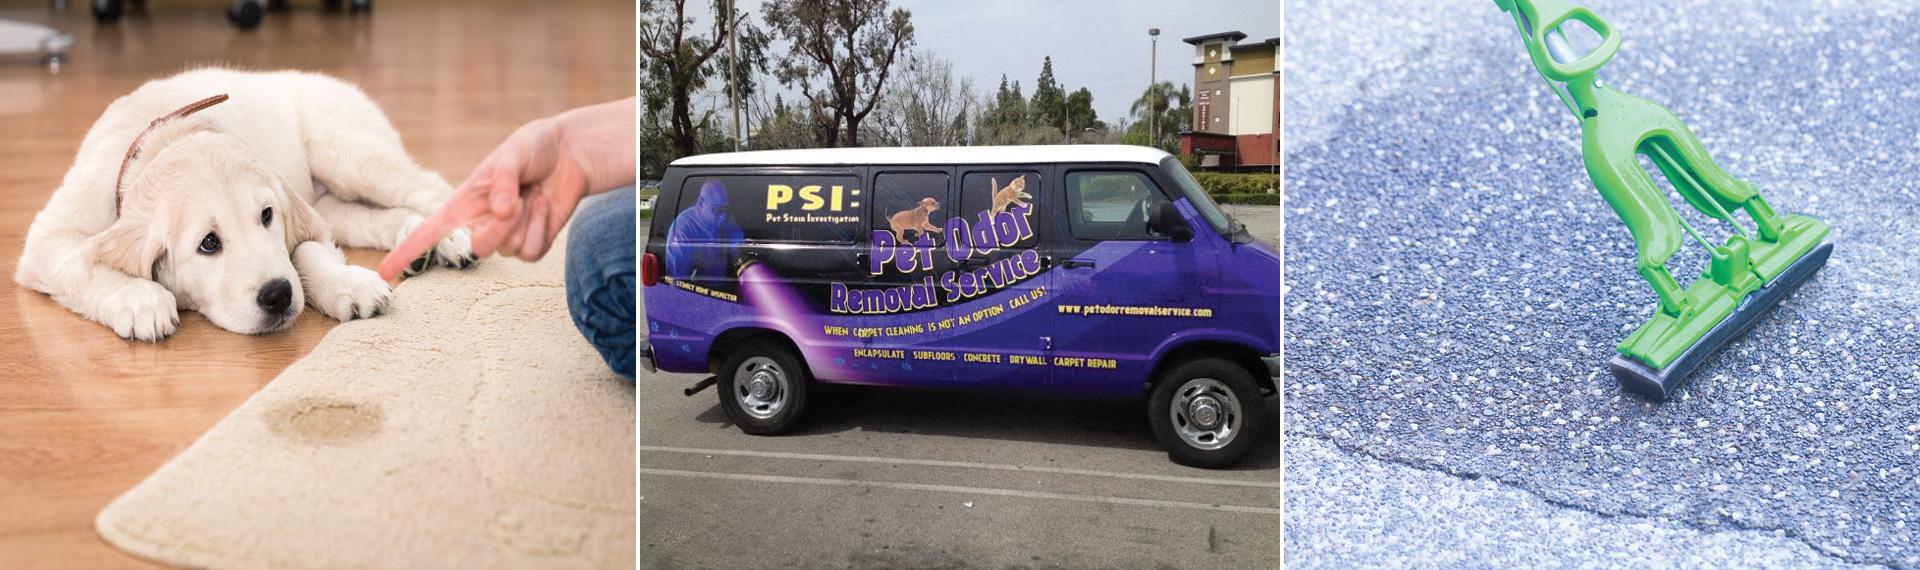 Pet Odor Removal Service Santiago Canyon CA